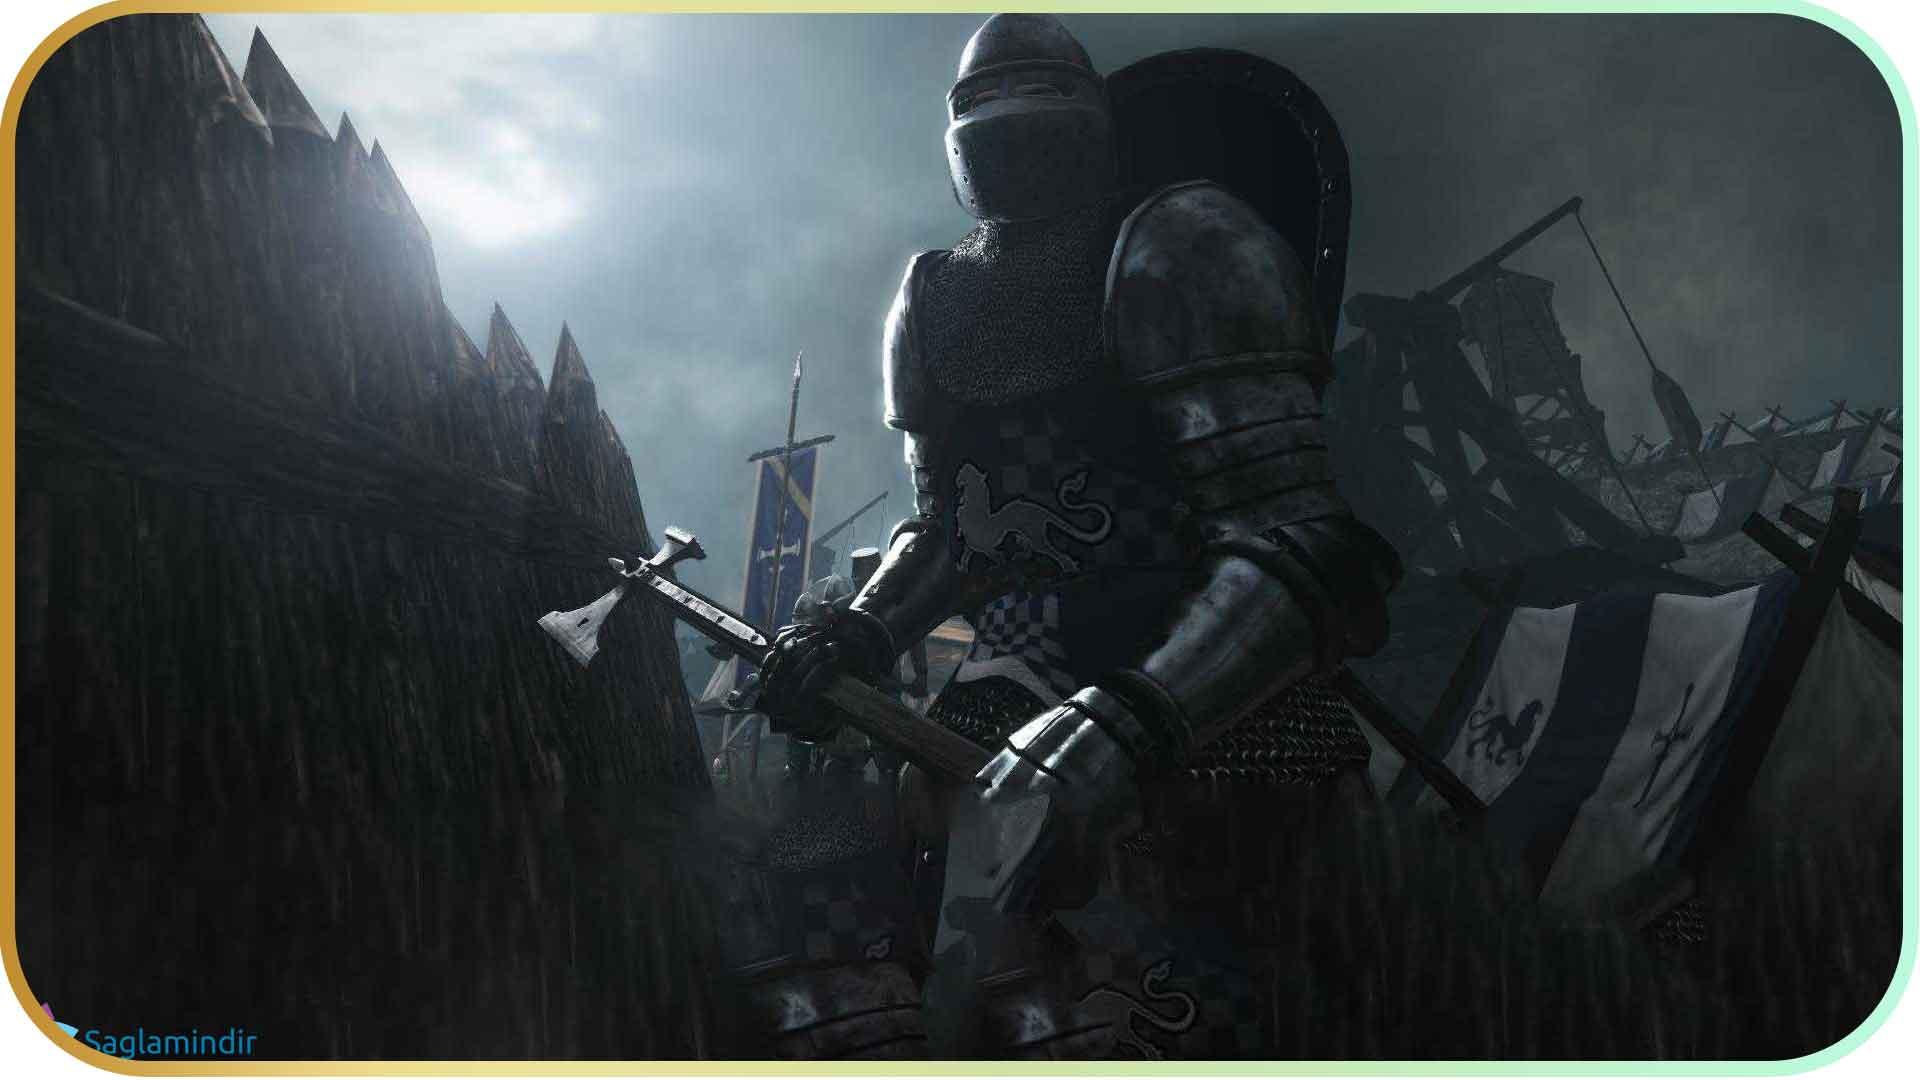 Chivalry Medieval Warfare saglamindir